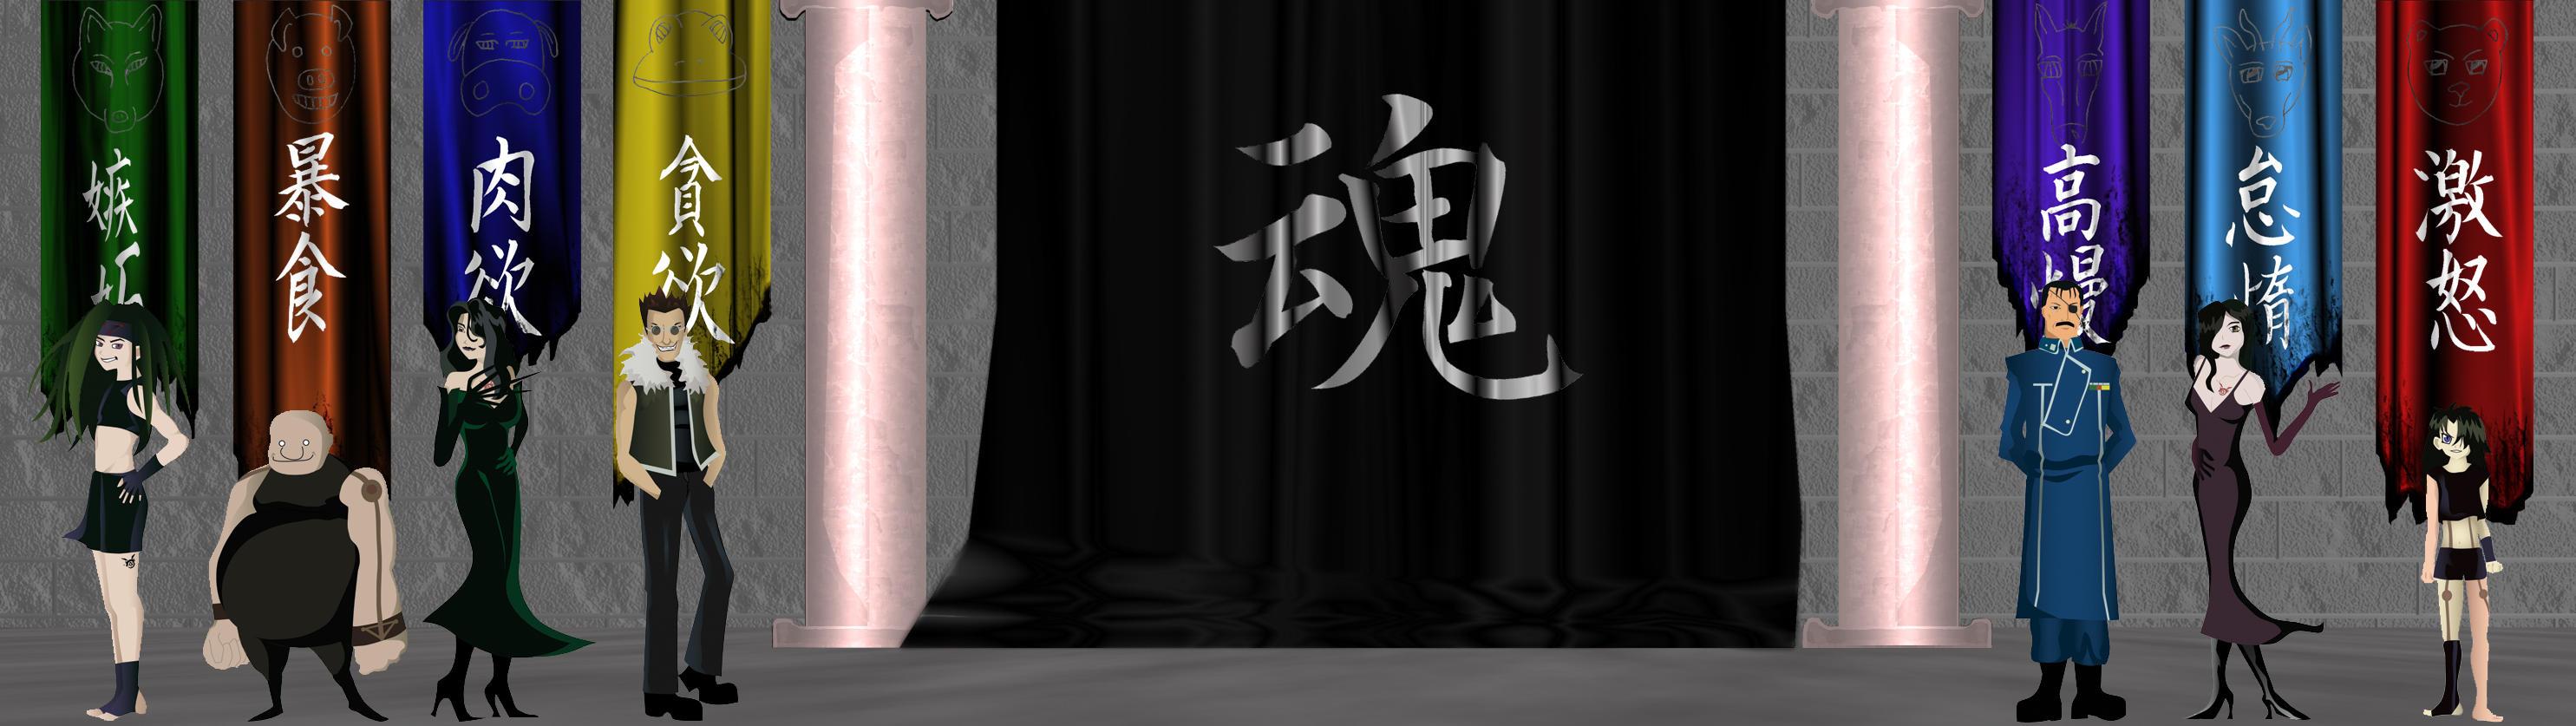 Fullmetal Alchemist: 7 Sins by Vashtastic on DeviantArt